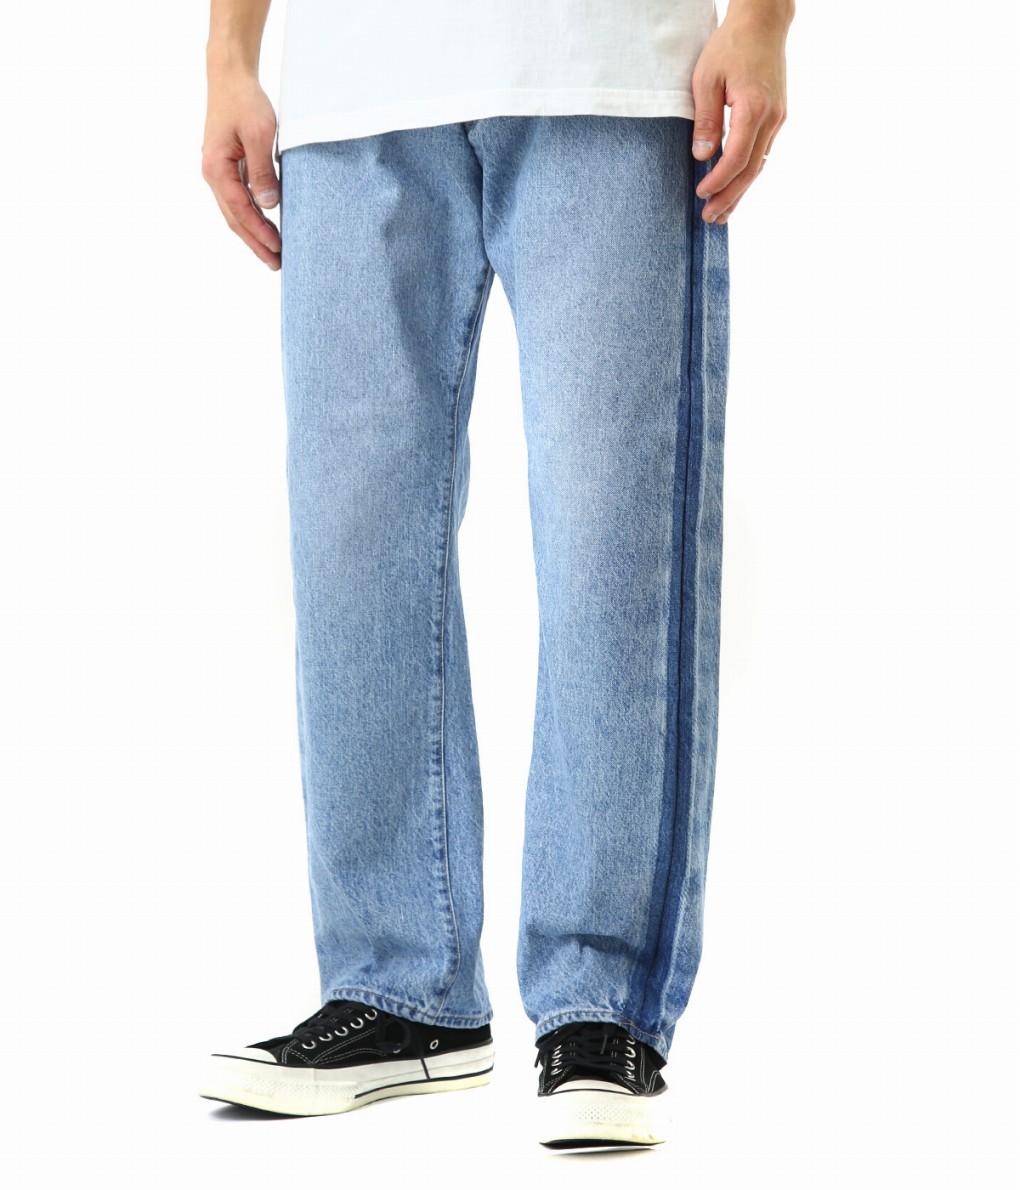 KAPTAIN SUNSHINE / キャプテンサンシャイン : Baggy Cut Straight Denim pants (Washed&remaked Side-seam) : デニムパンツ パンツ メンズ : KS9SPT23 【NOA】